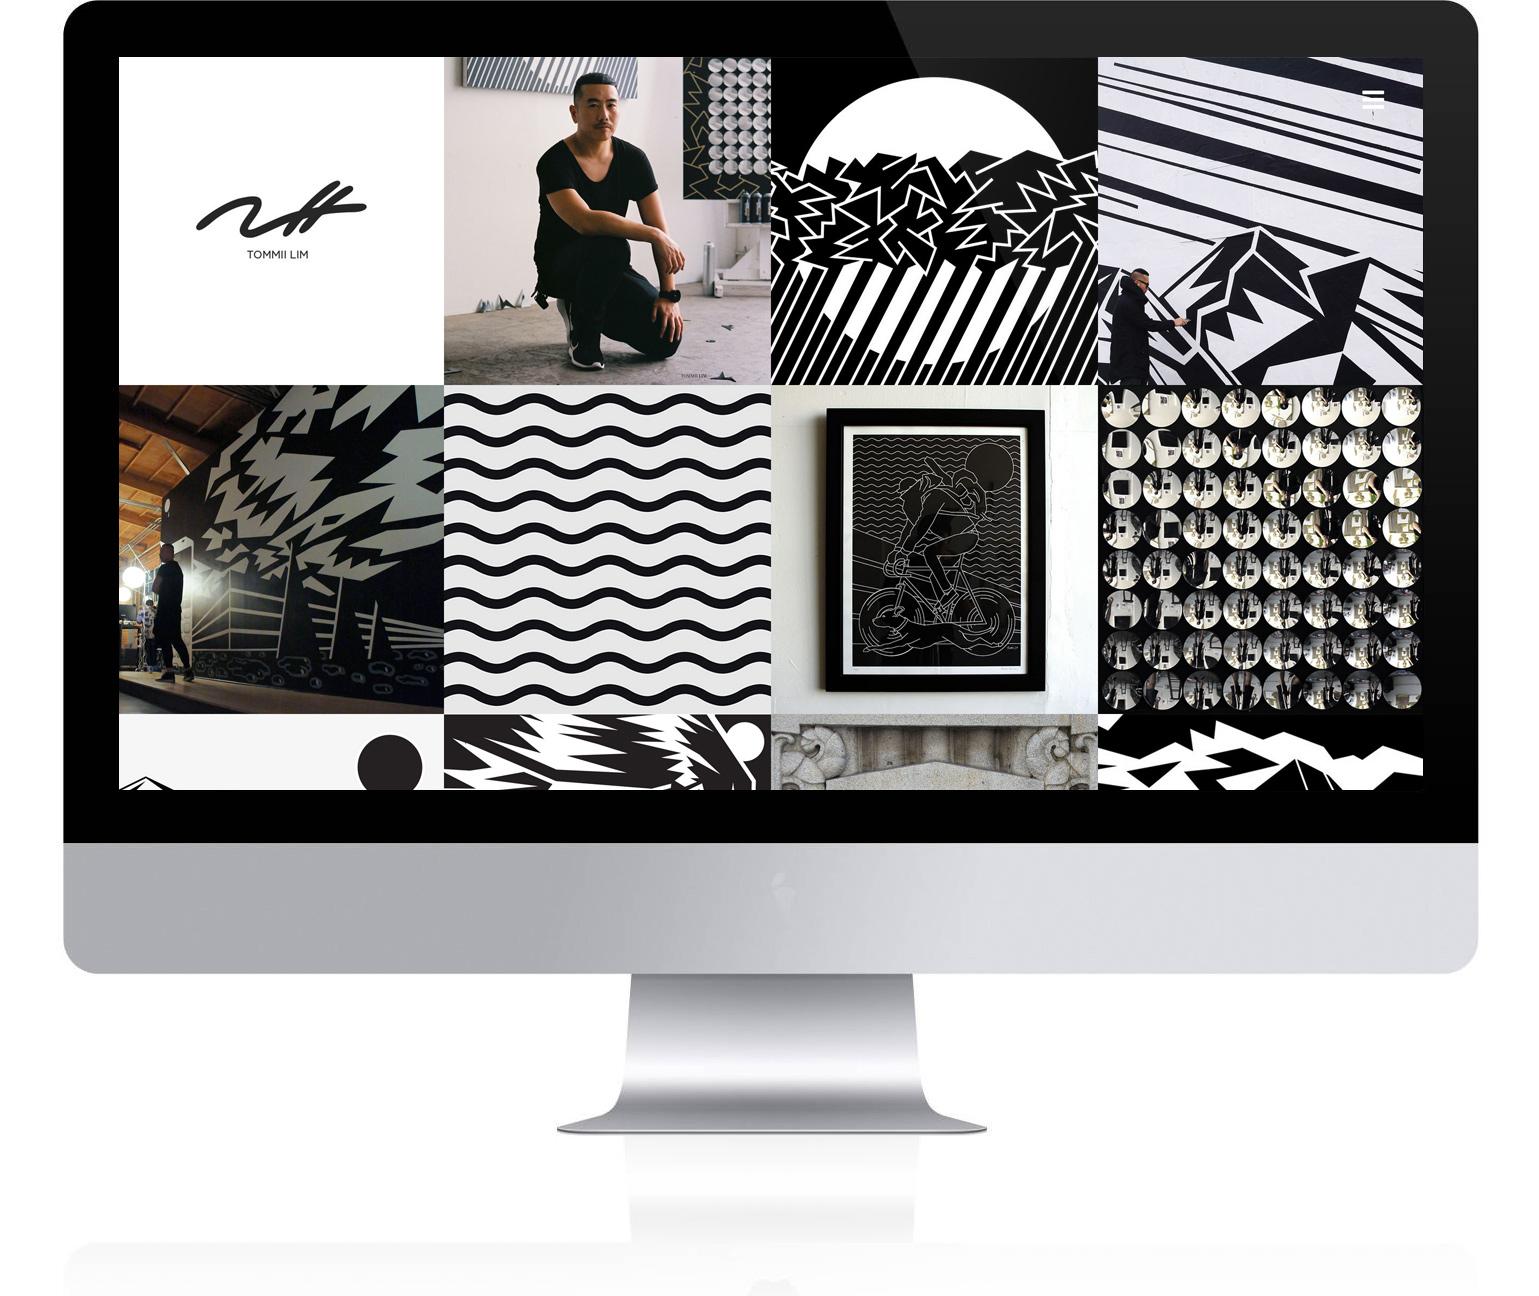 Uglyfresh-Mac-Screen-01.jpg